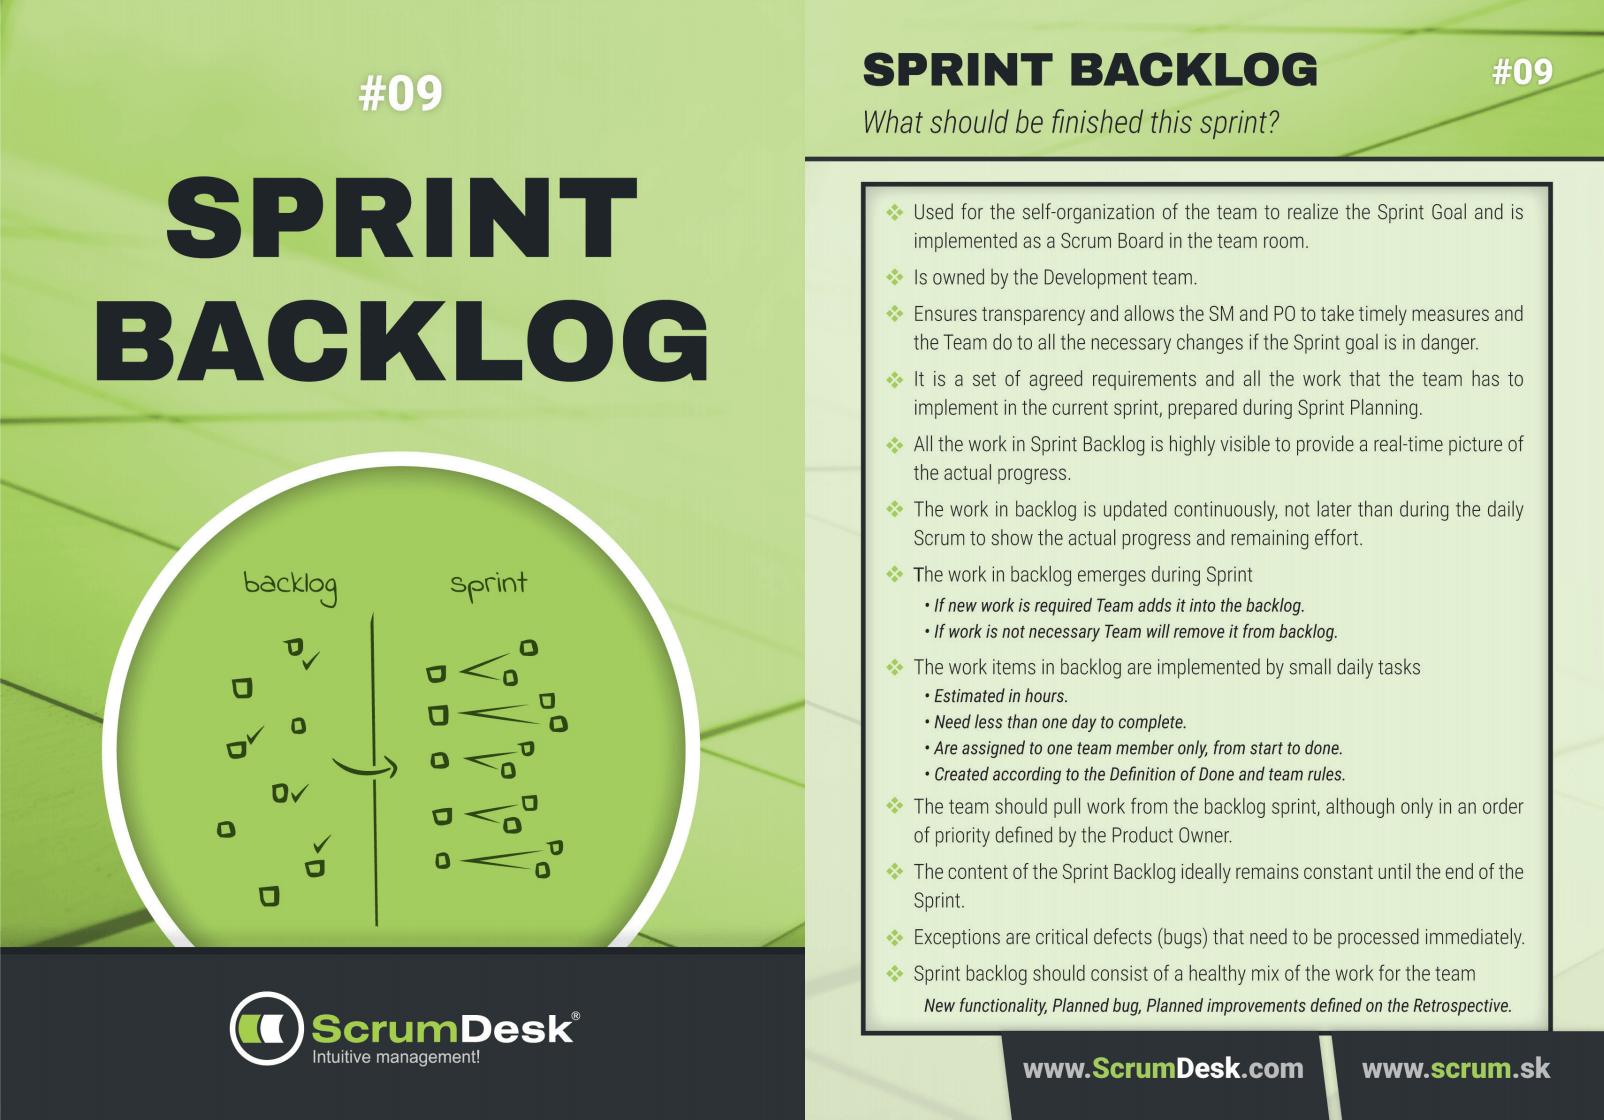 Karty 09 - Sprint Backlog